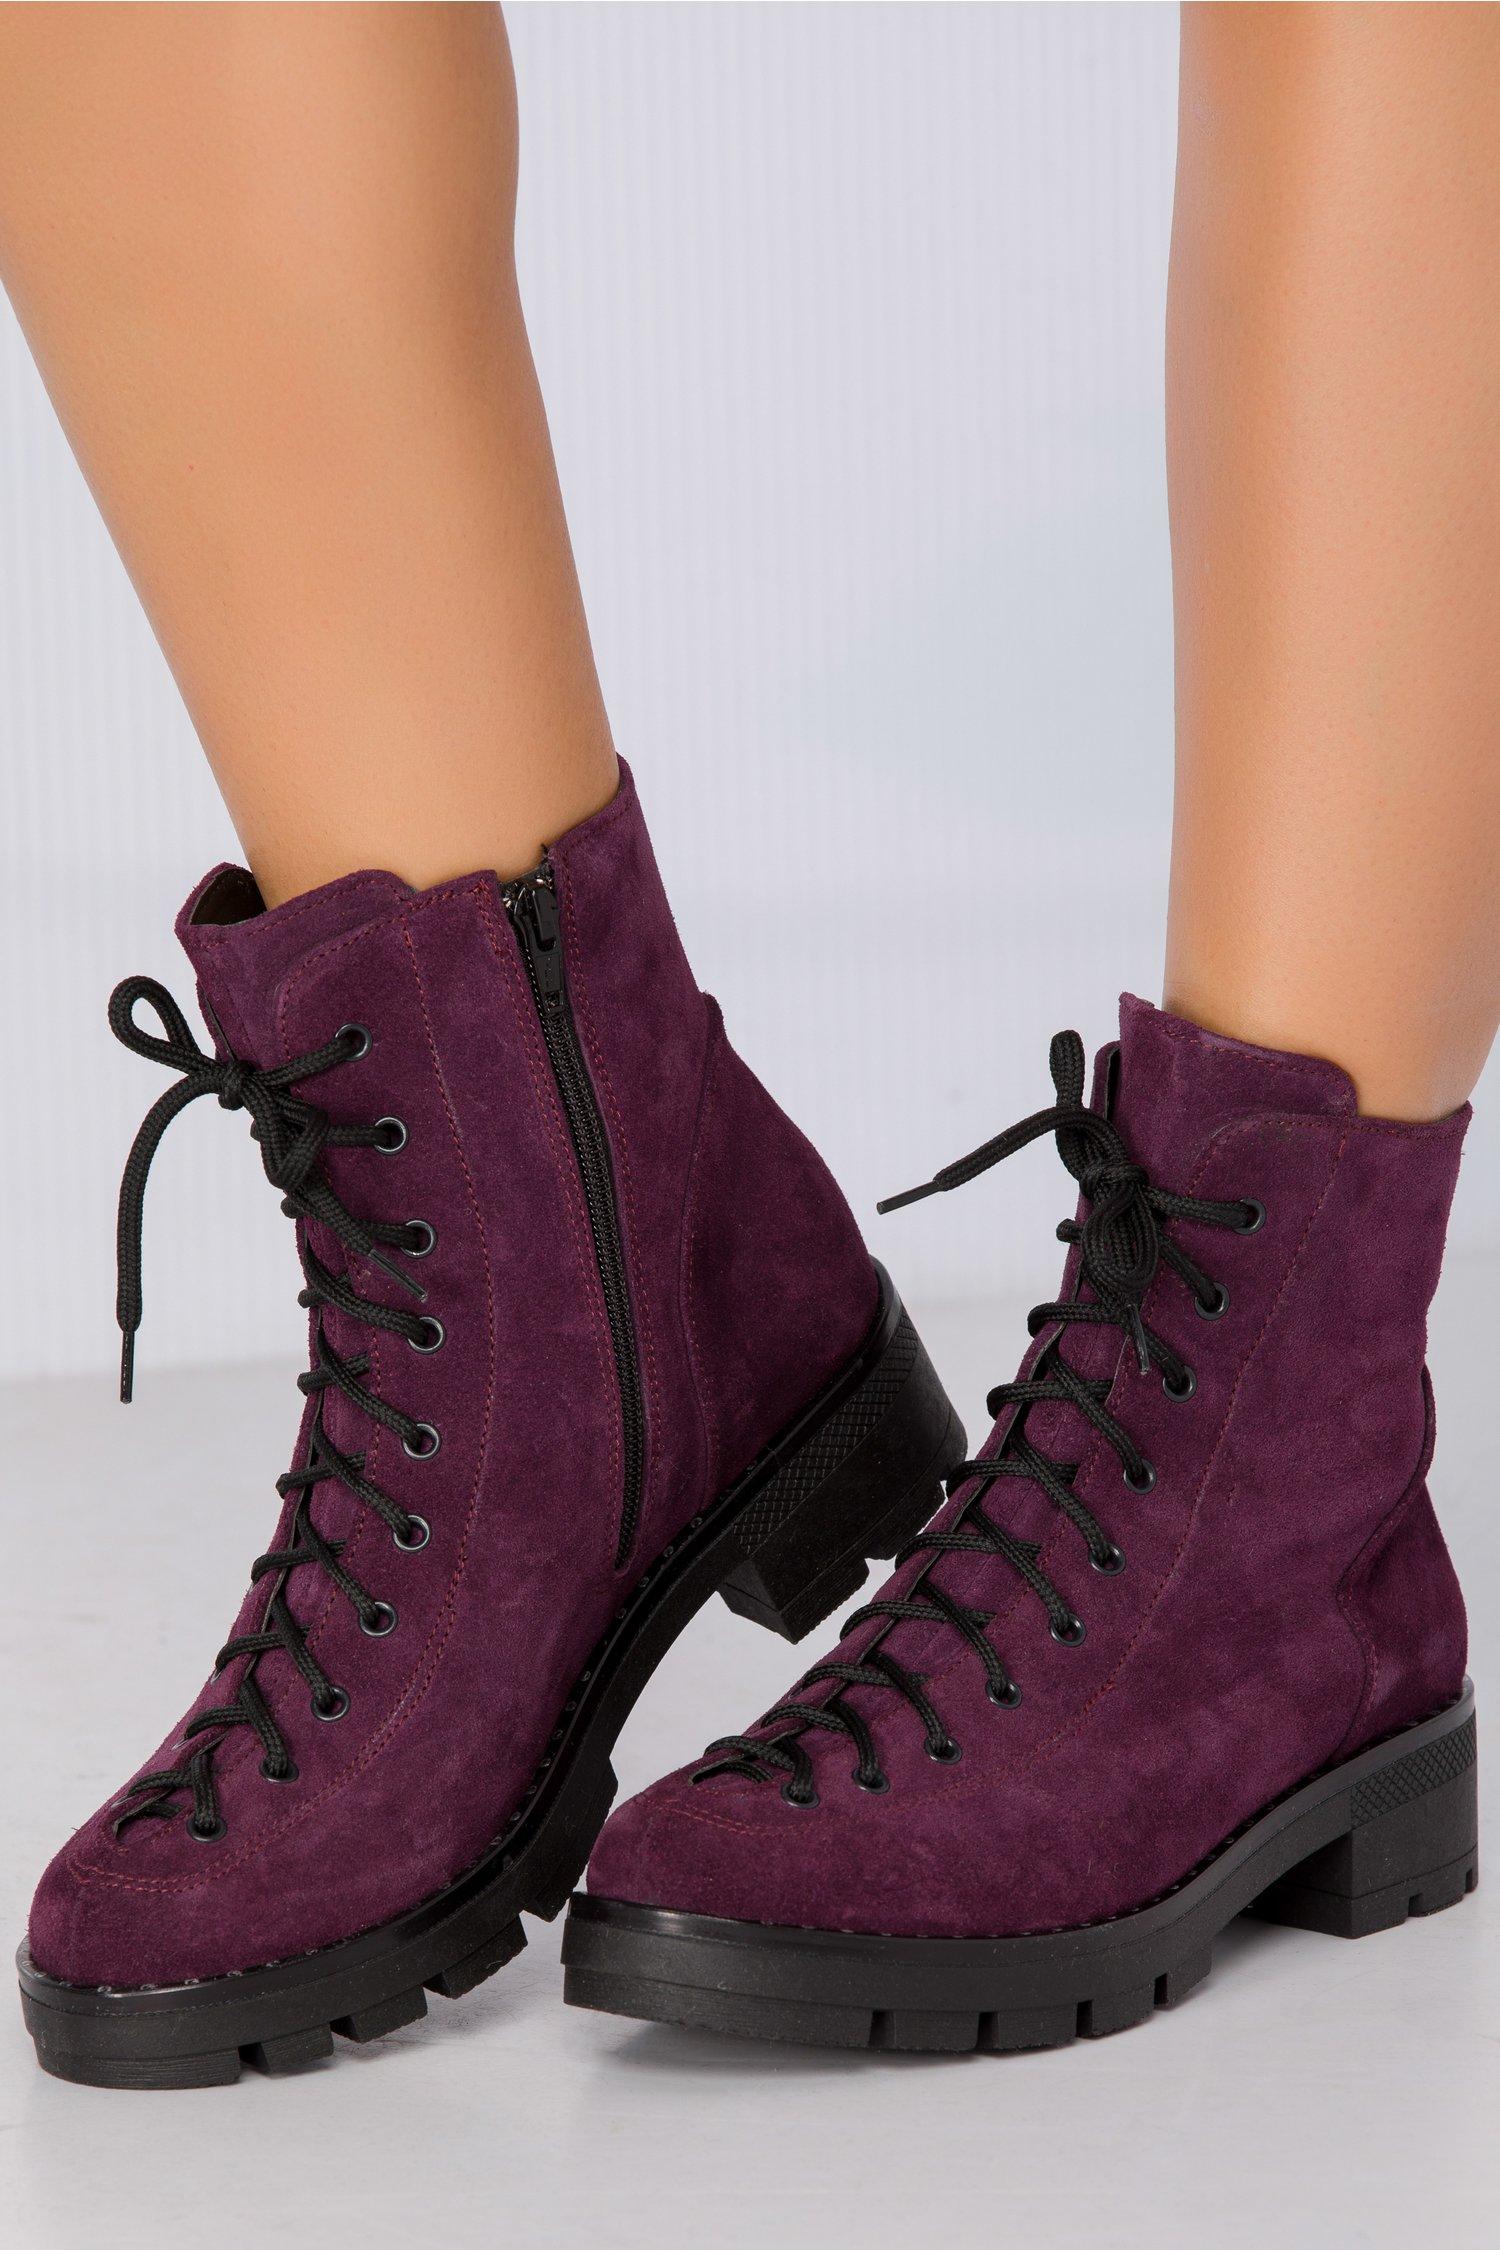 Ghete Lacy violet imblanite